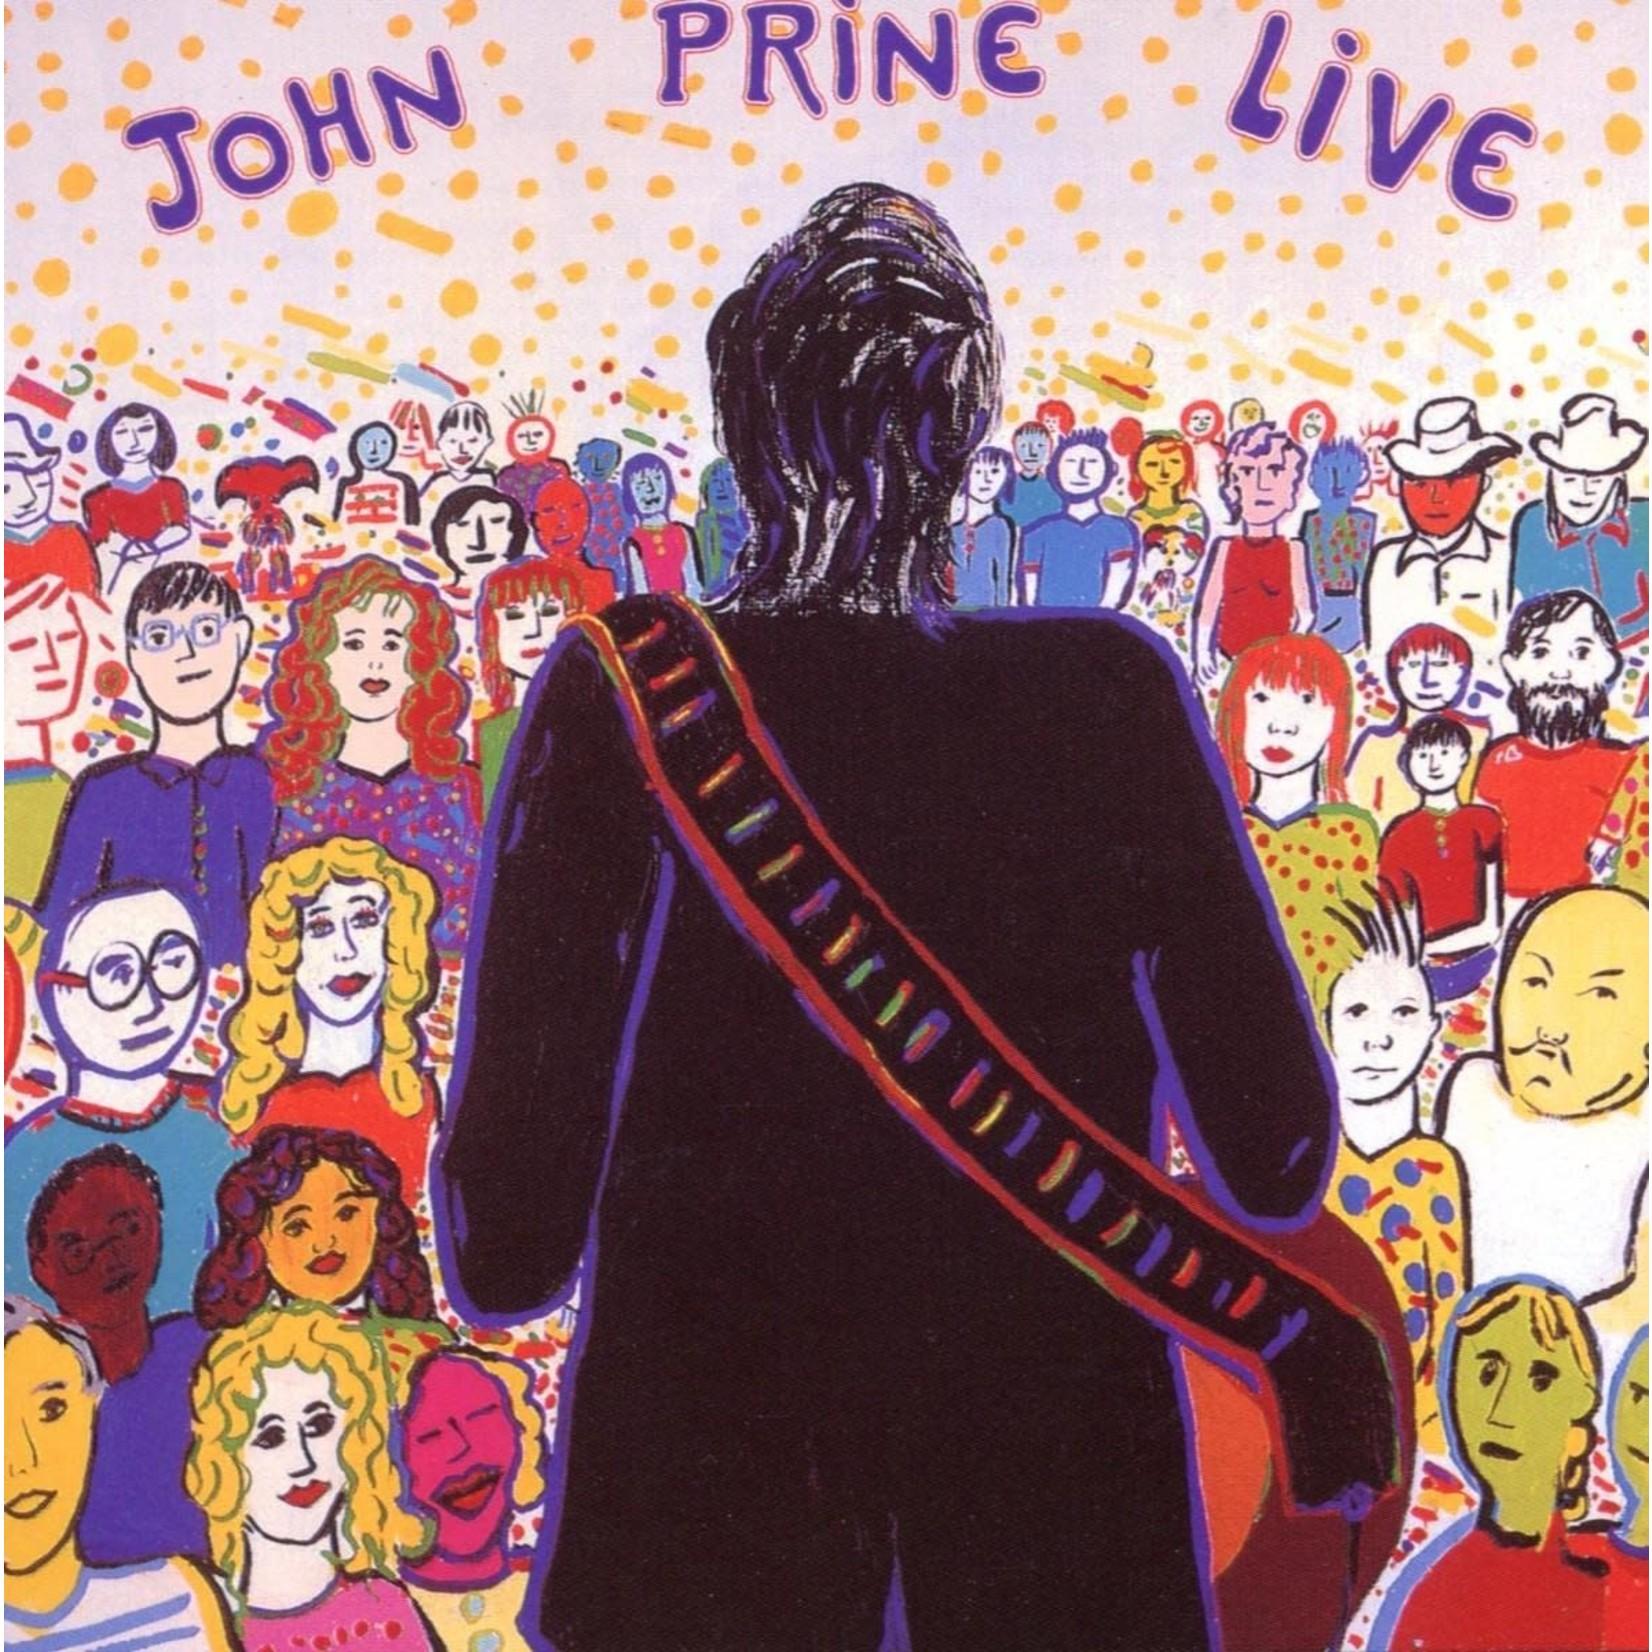 PRINE_ JOHN- JOHN PRINE (LIVE) -INDIE- (VINYL)